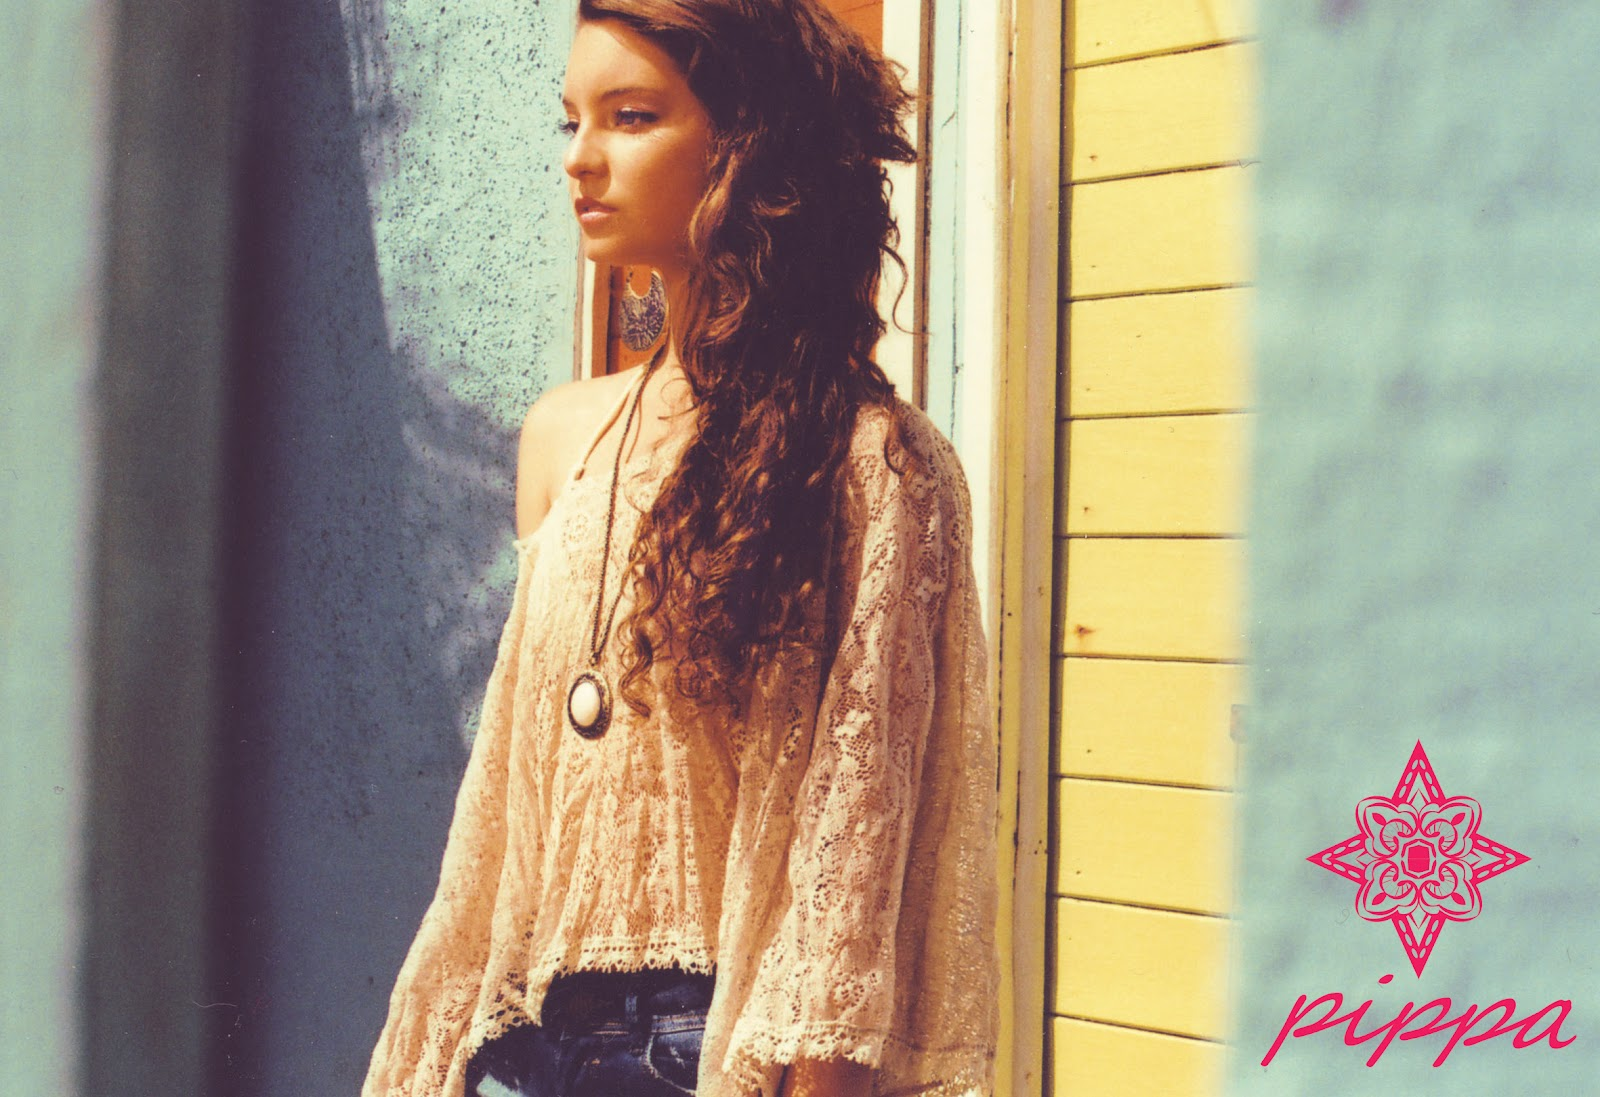 Venta de ropa hippie online argentina